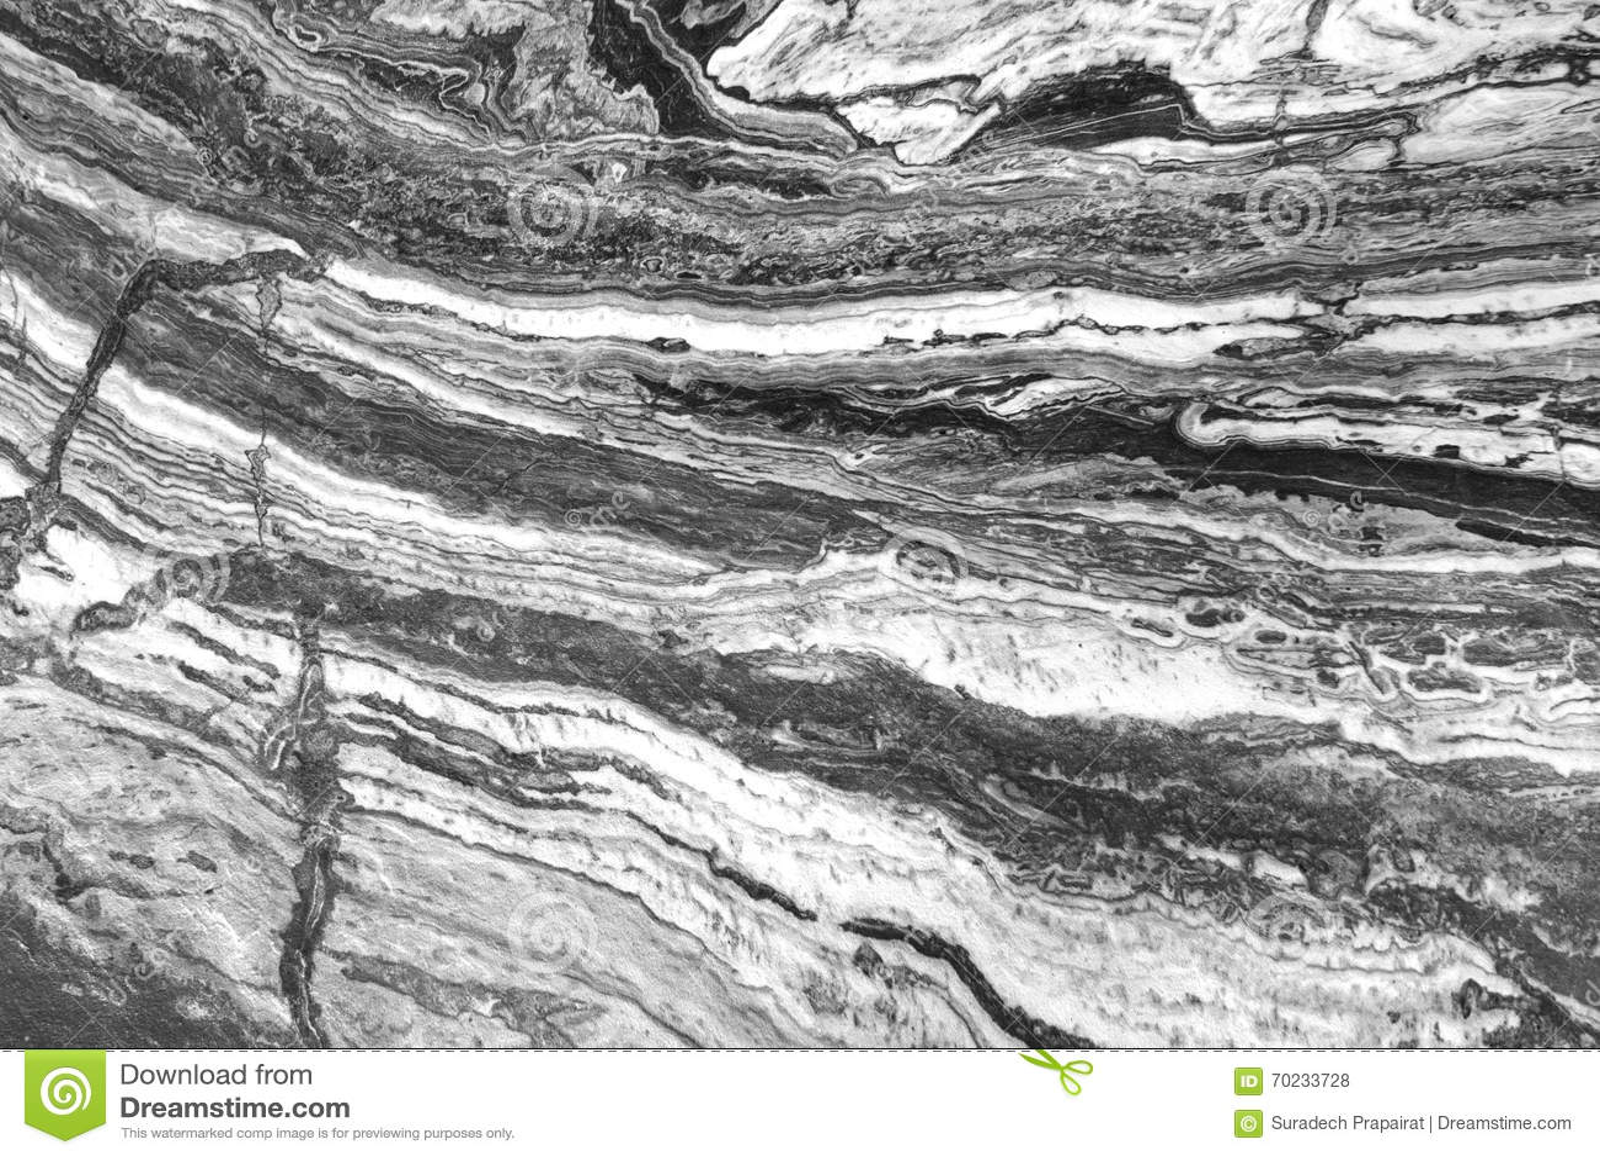 Black Marble Wallpaper Granite Texture Marble Layers Design Gray Stone Slab